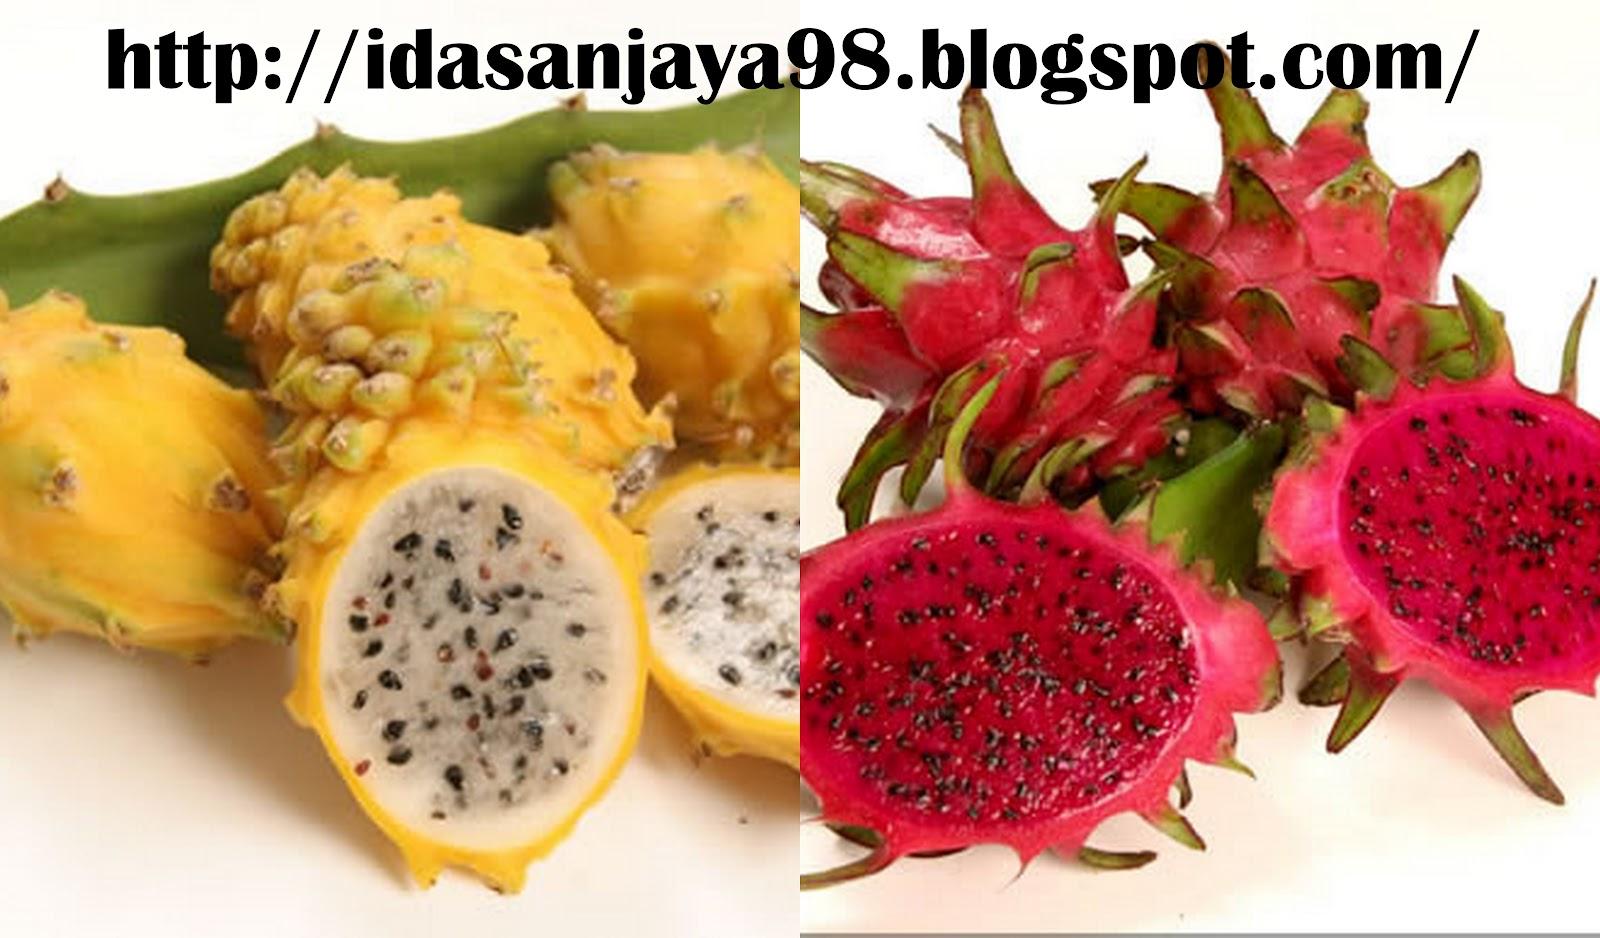 Ida Sanjaya Blogger Dragon Fruit Is Very Profitable Transactions